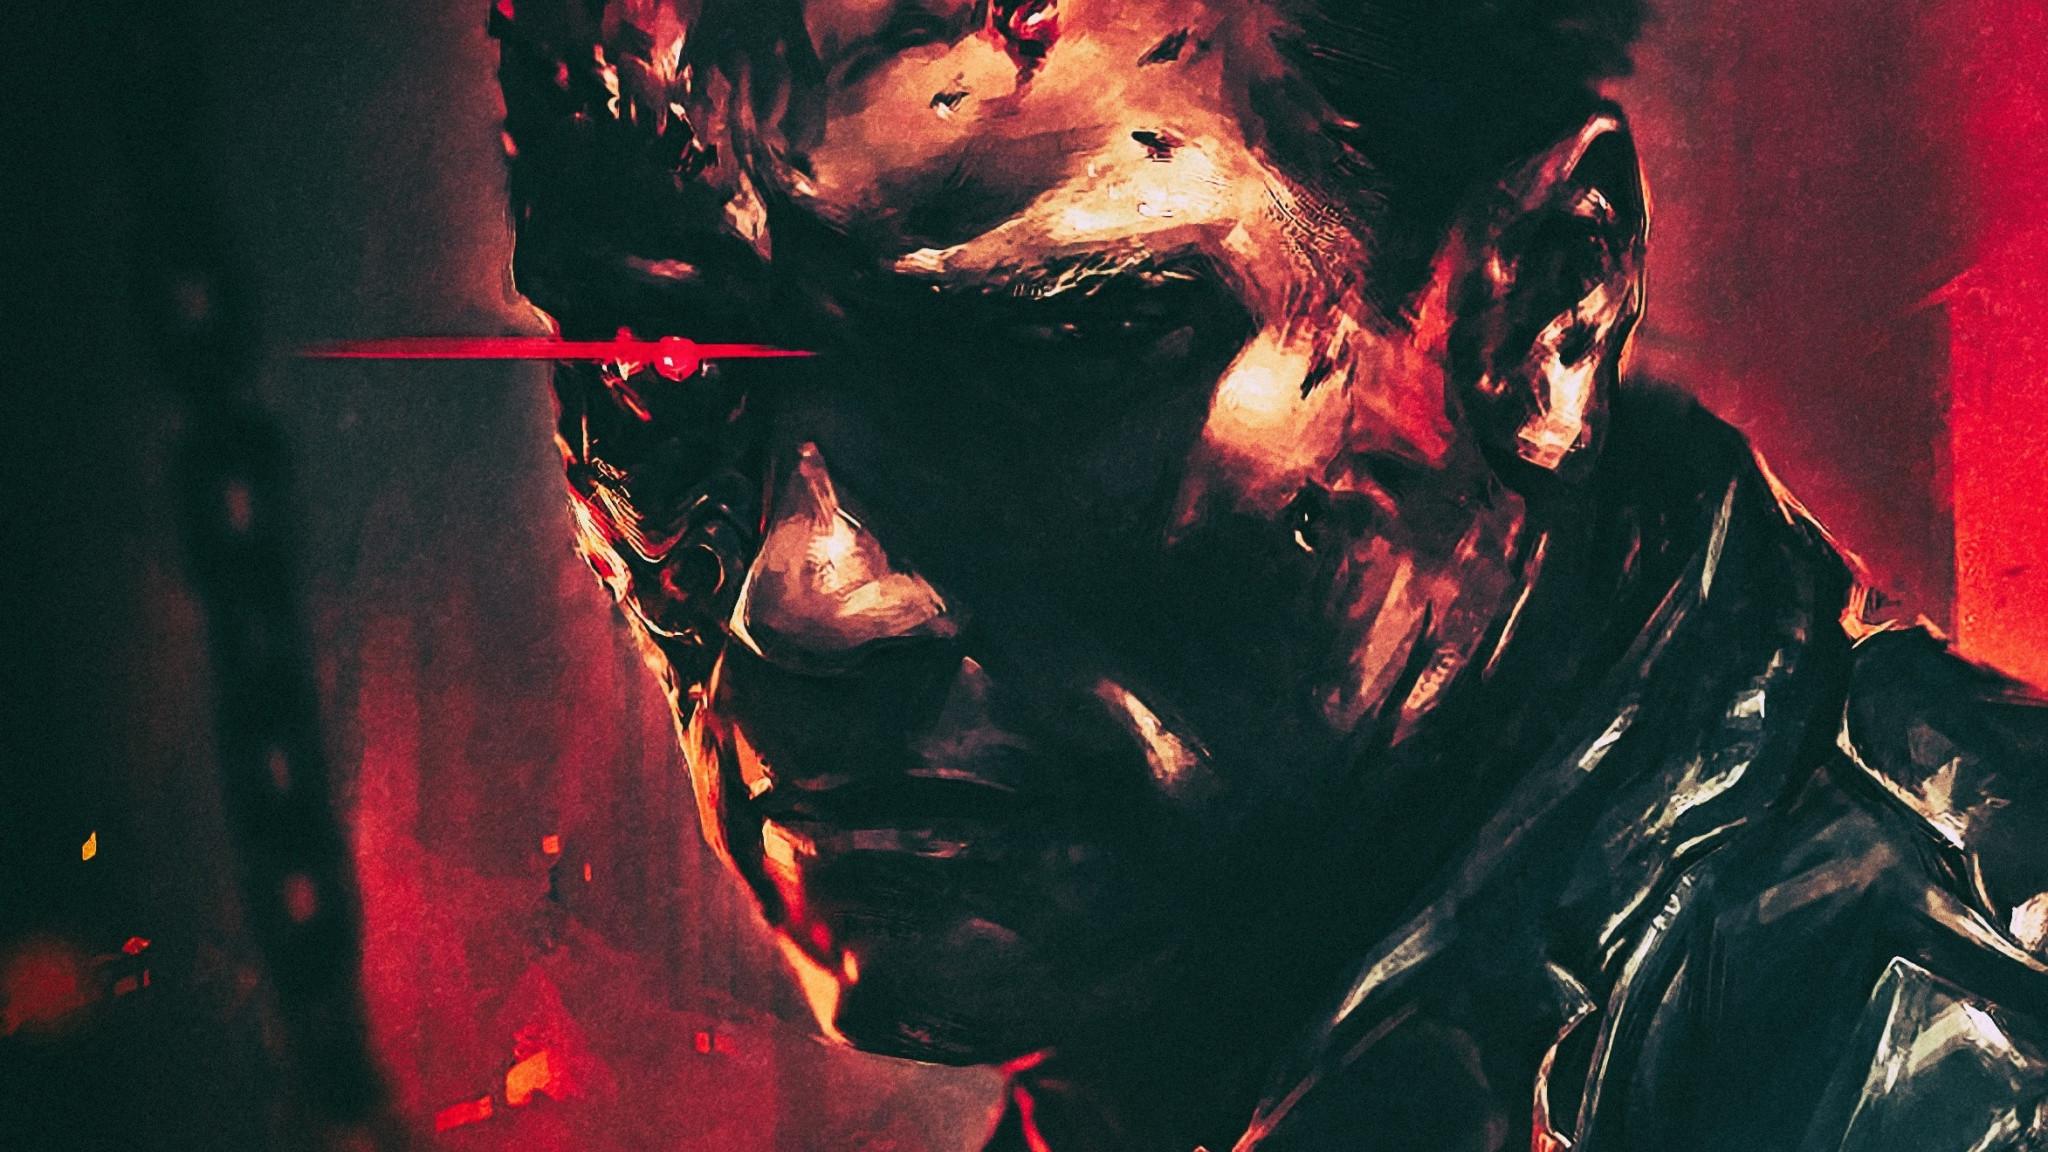 Res: 2048x1152, Terminator 2, T-800, cyborg, Arnold Schwarzenegger, movie, art,